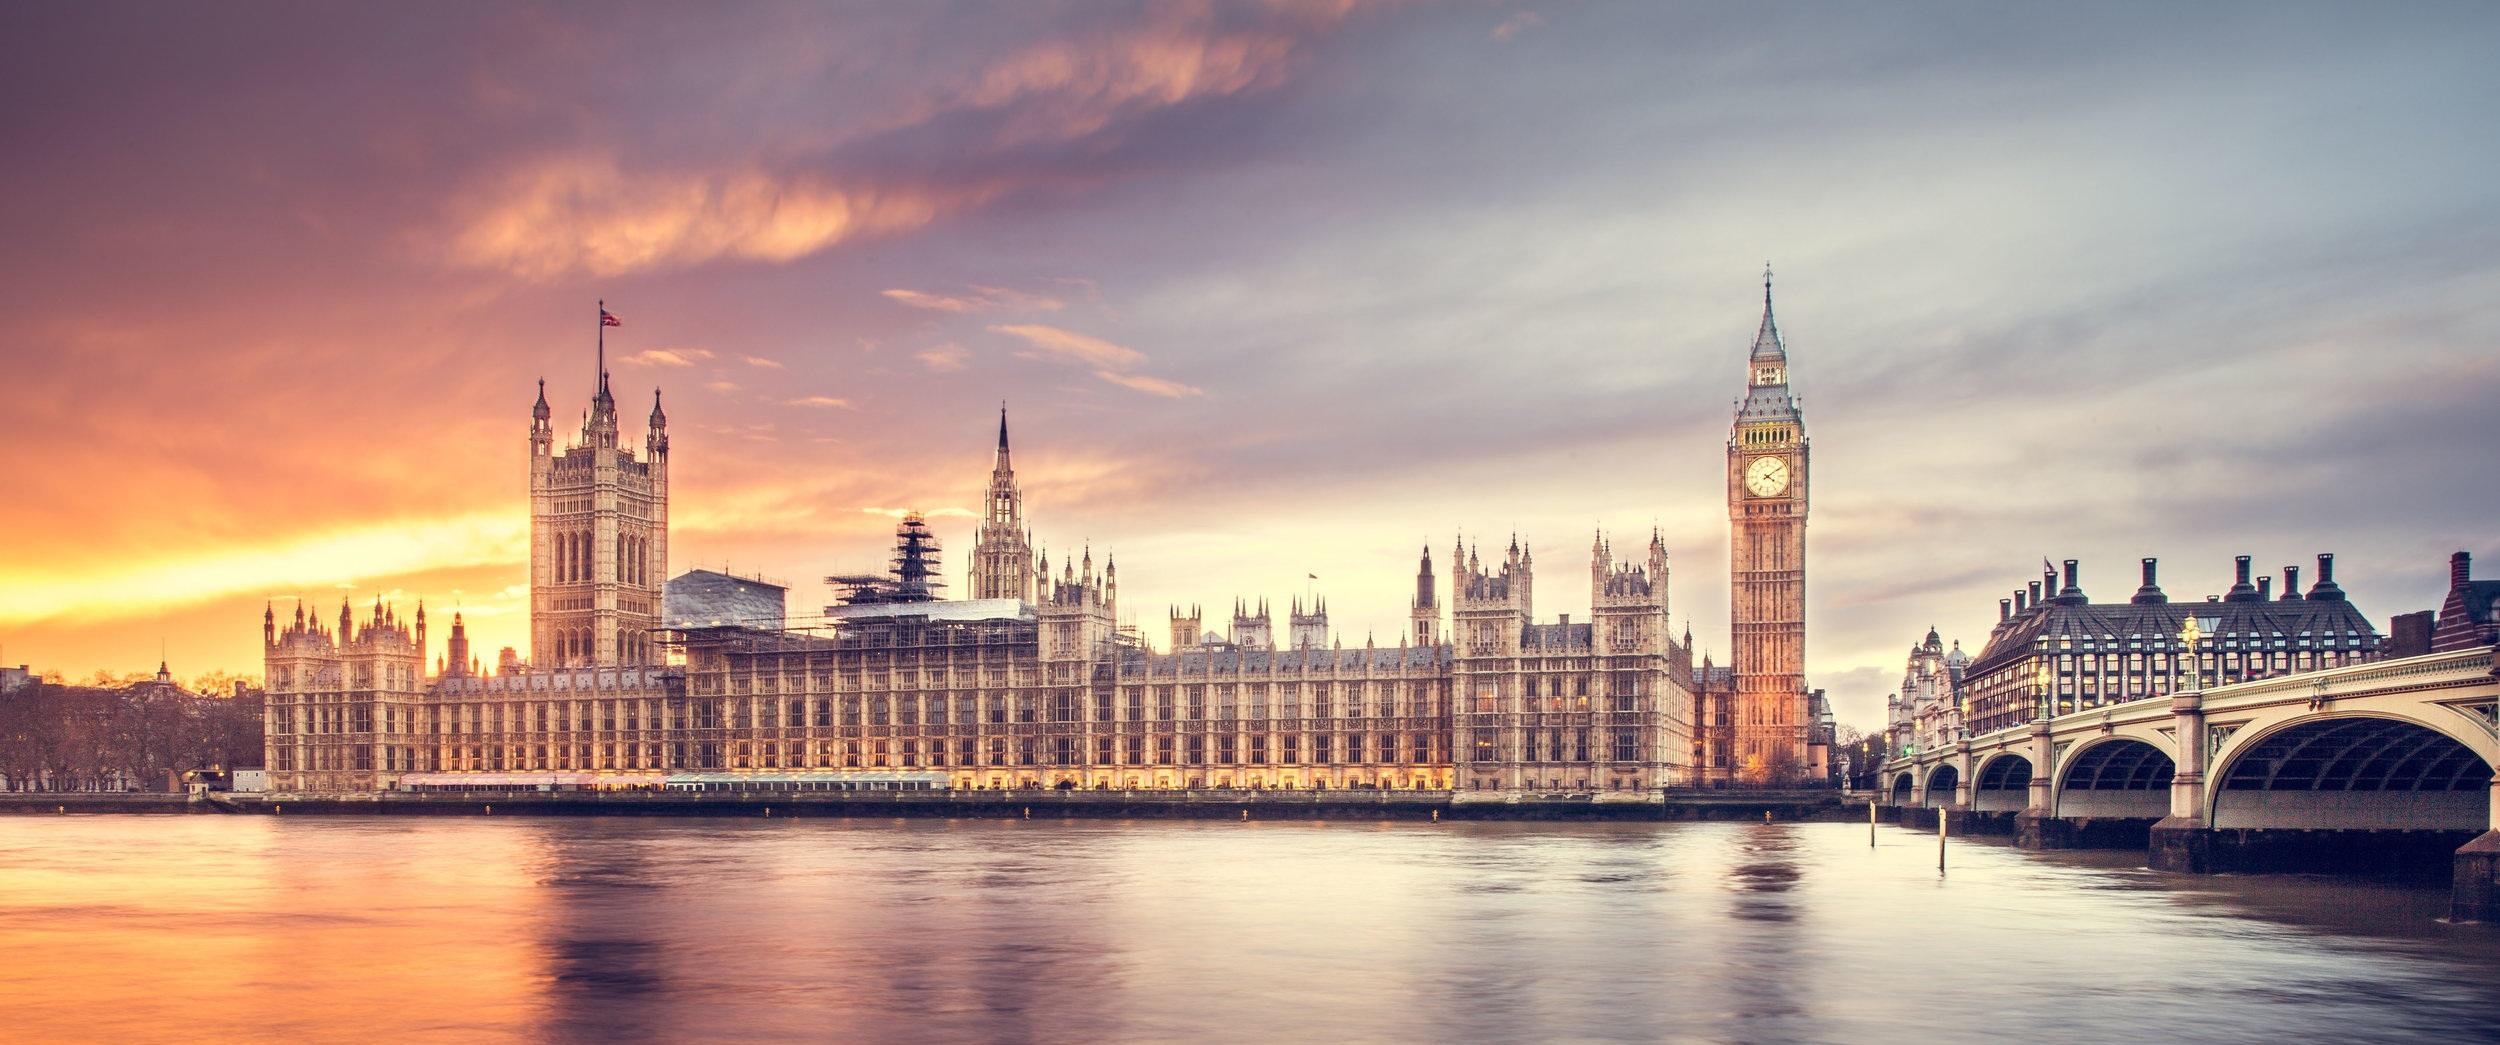 The Great Bell (Big Ben), London, England, United Kingdom